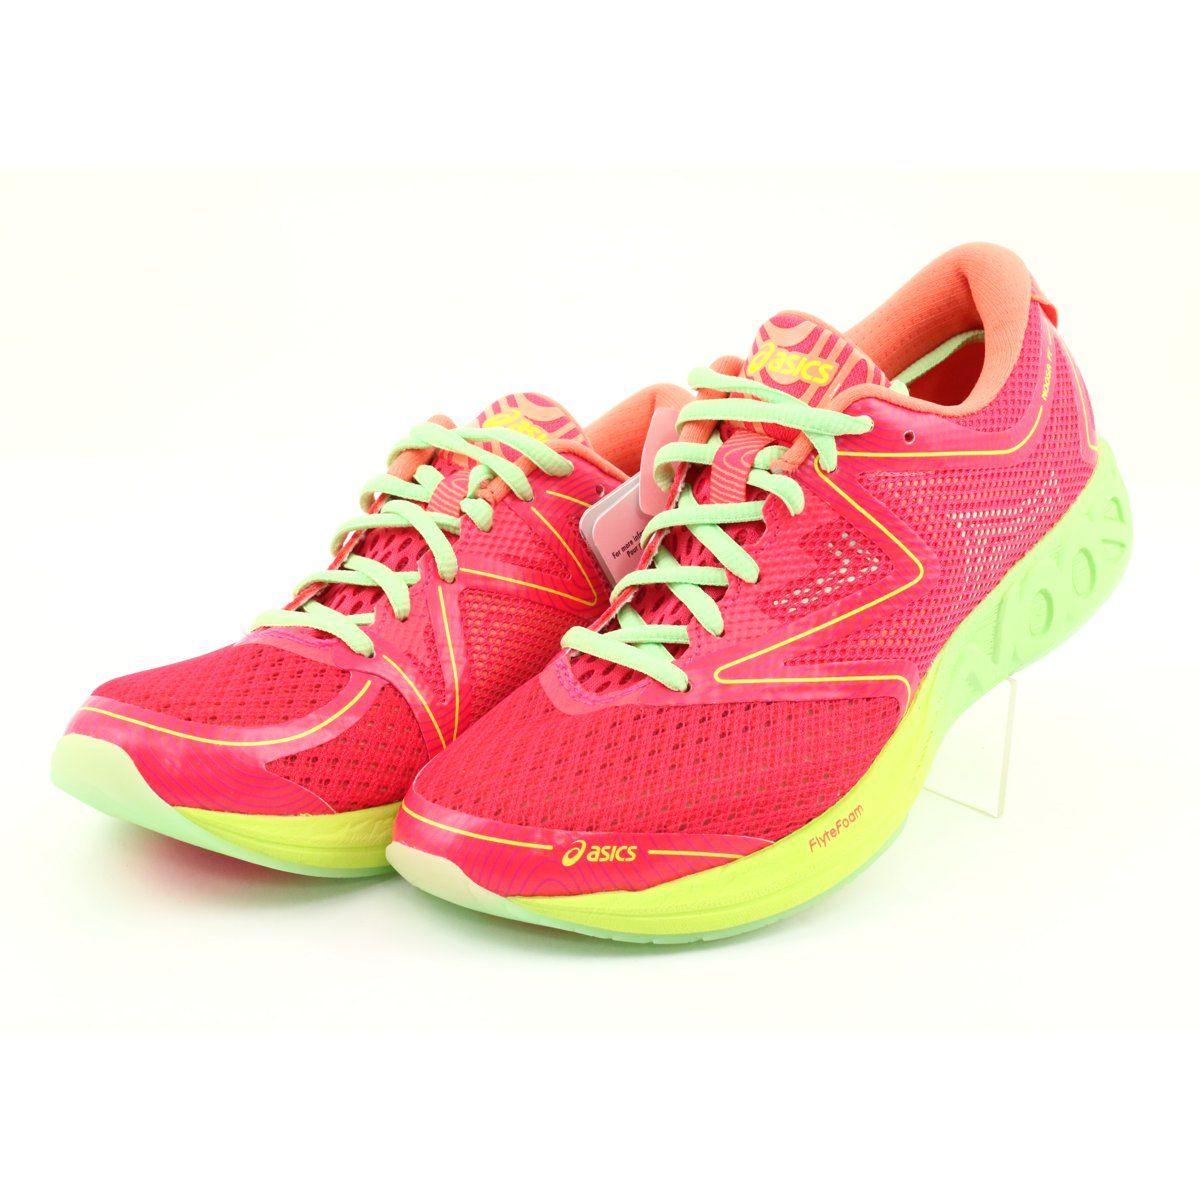 Asics Noosa Ff Running Shoes W T772n 2087 Red Orange Green Yellow Running Shoes Asics Running Shoes Shoes